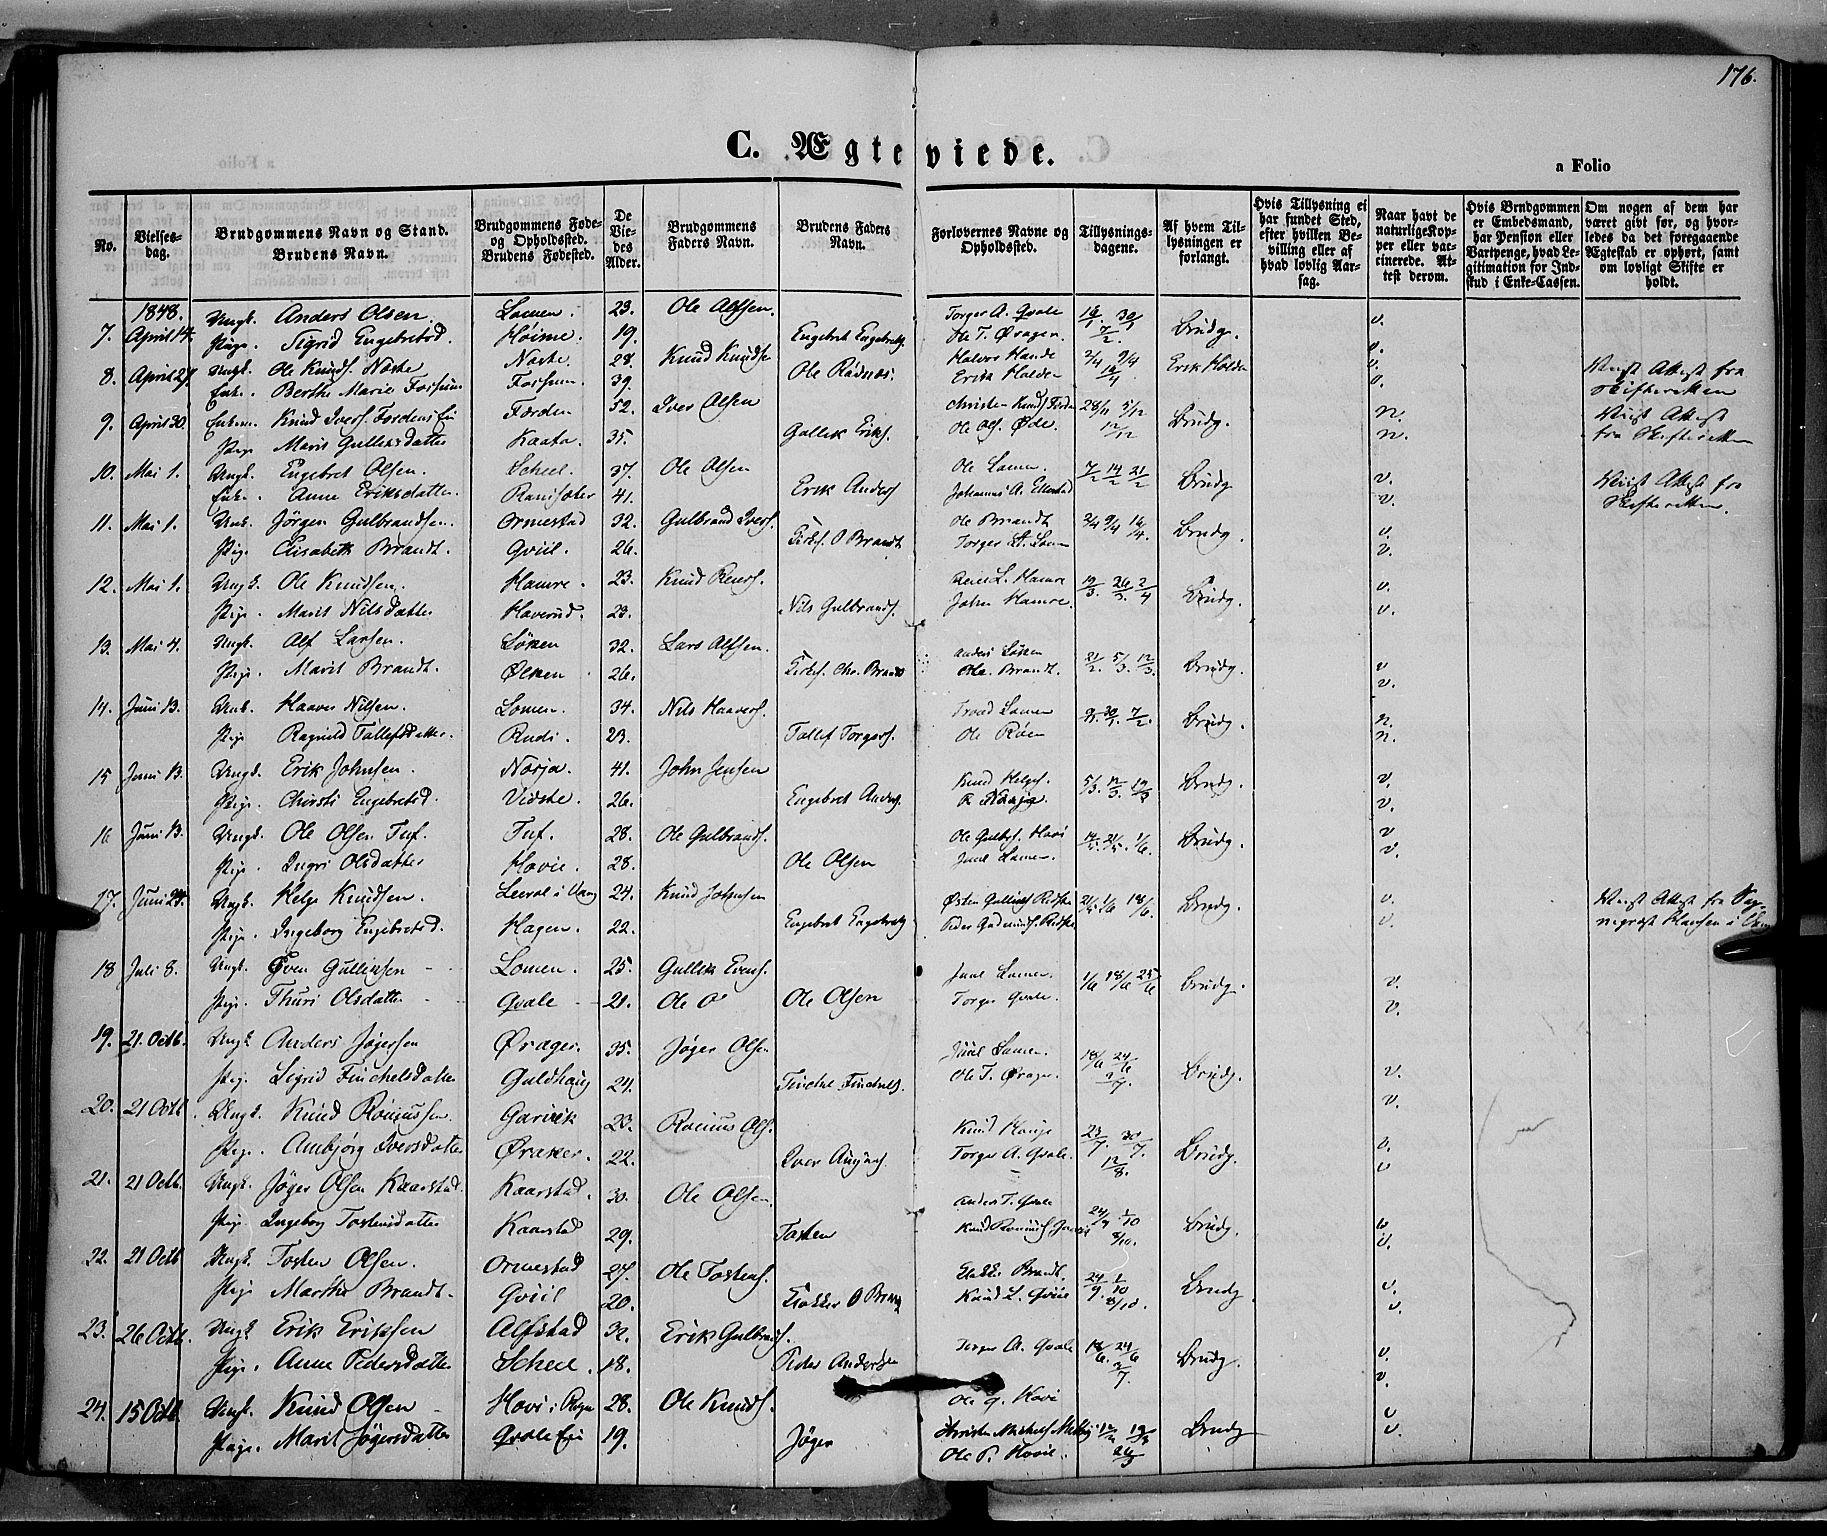 SAH, Vestre Slidre prestekontor, Ministerialbok nr. 1, 1844-1855, s. 176